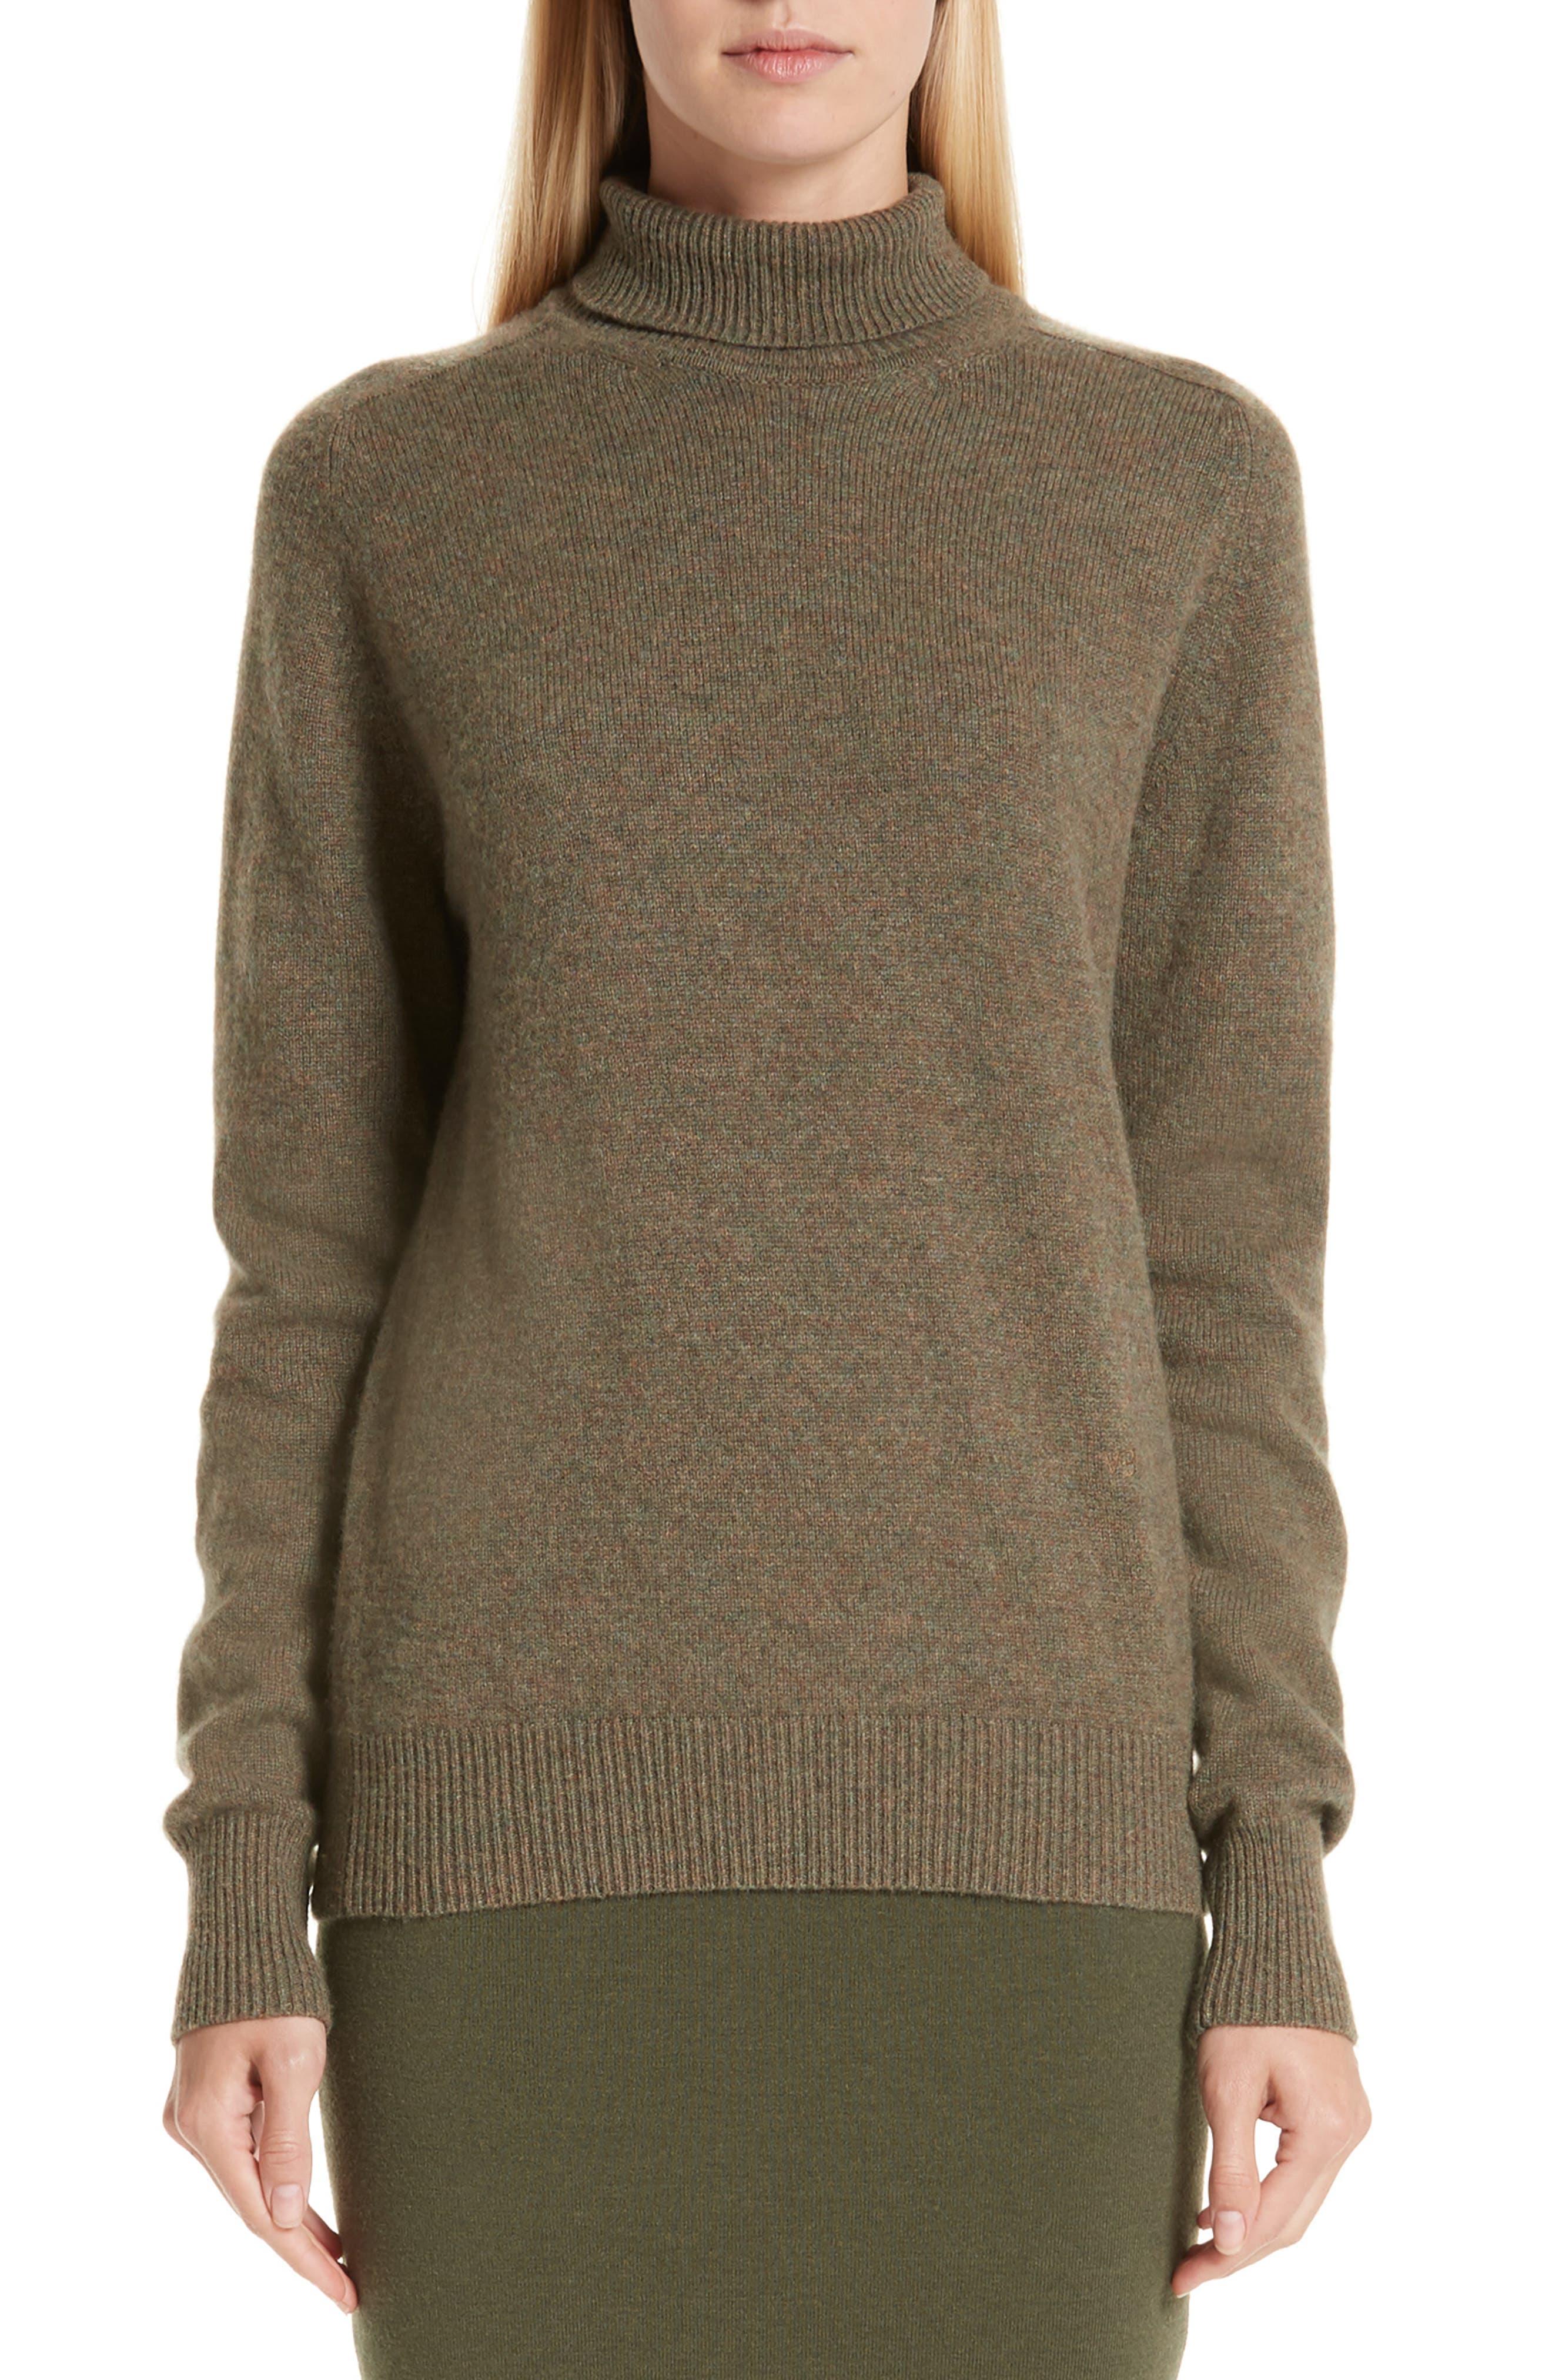 VICTORIA BECKHAM, Stretch Cashmere Turtleneck Sweater, Main thumbnail 1, color, OLIVE